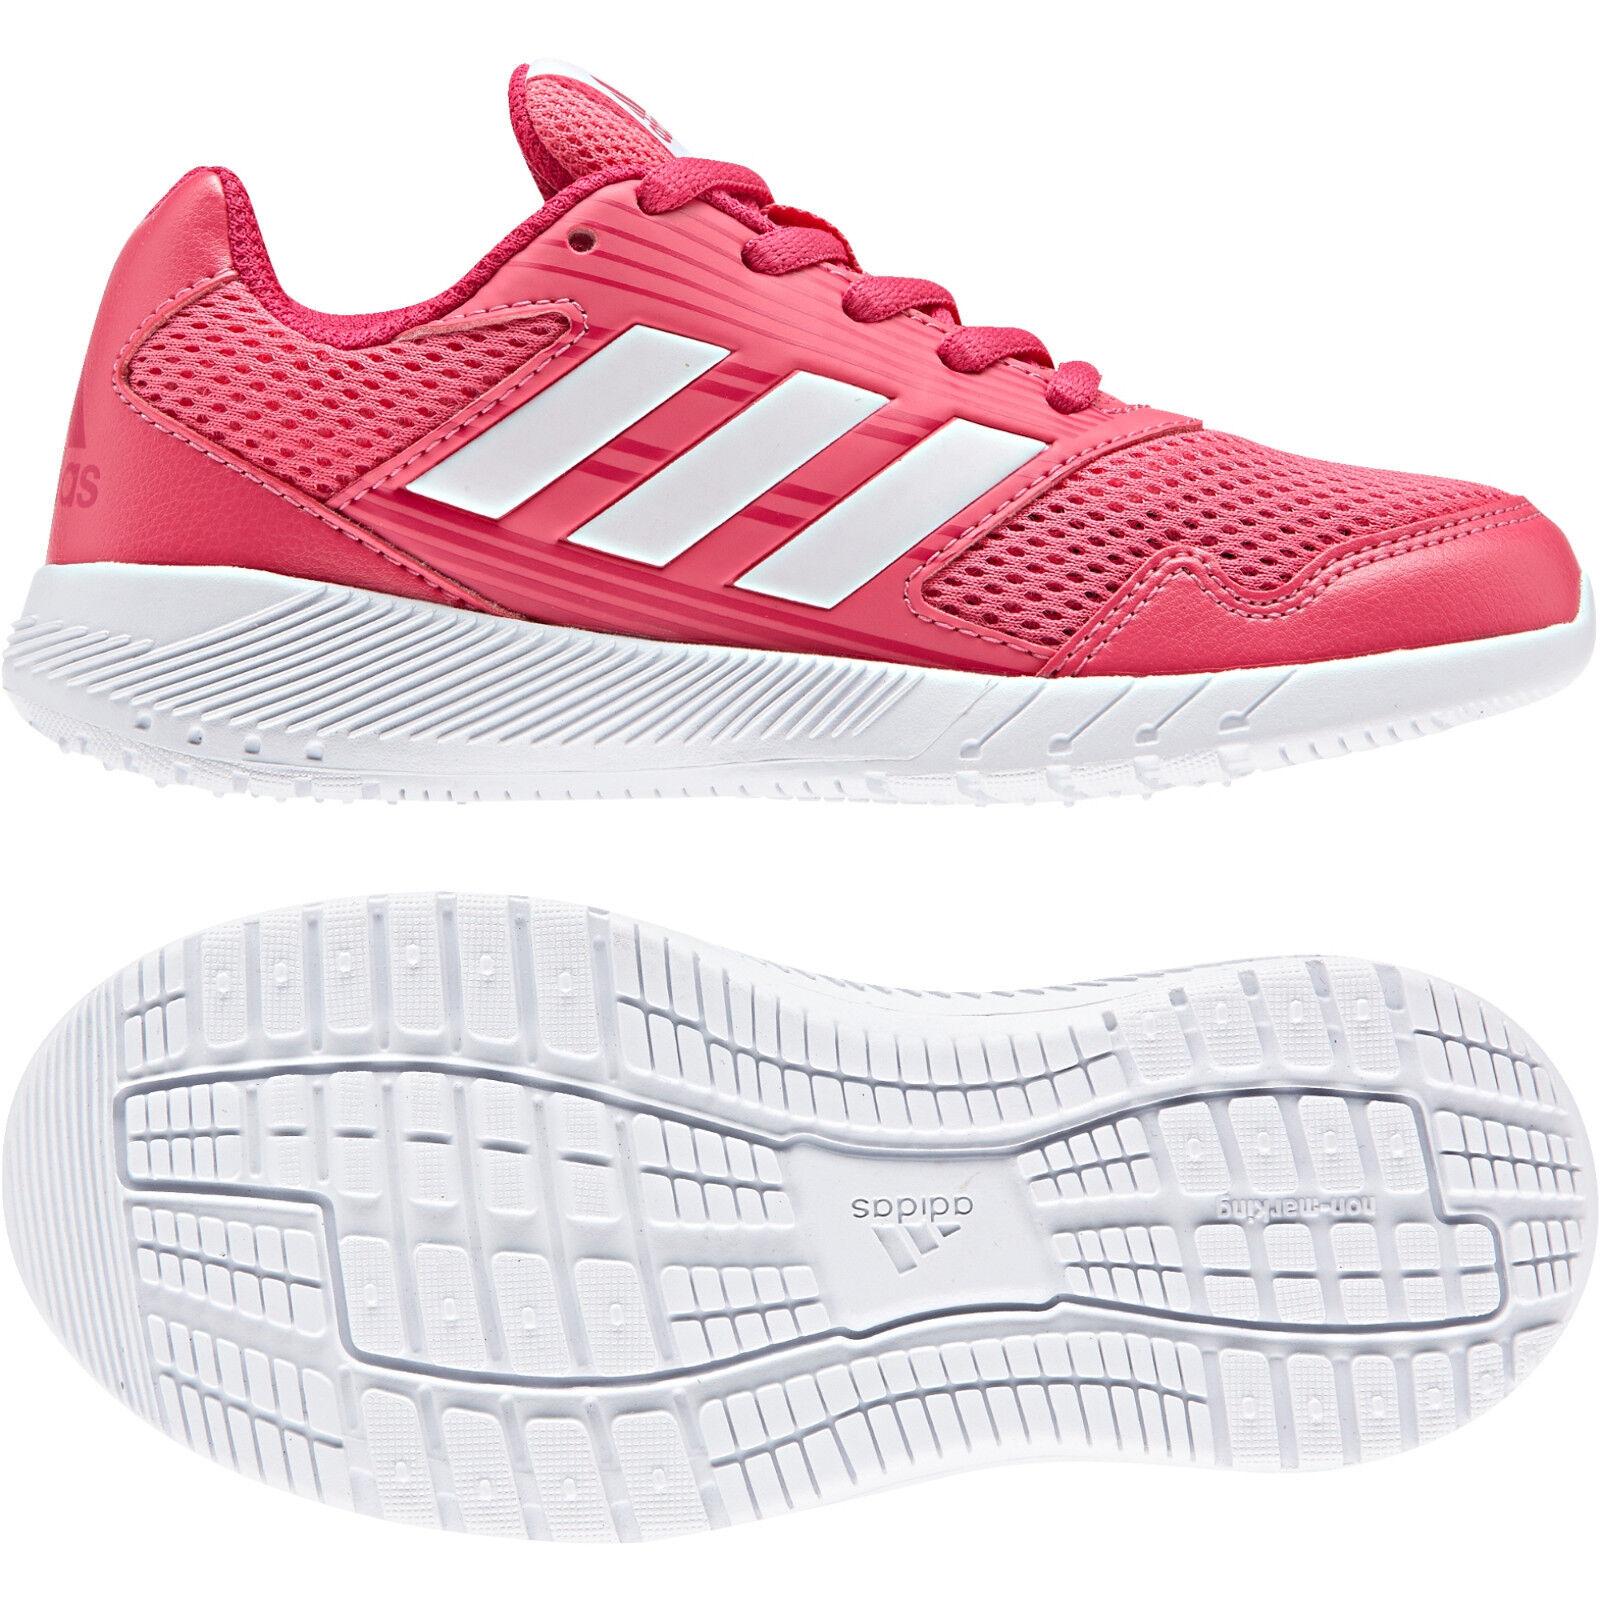 Adidas Enfants Jeunes Filles Chaussures Altarun Training Sporty Running Trainers CQ0038